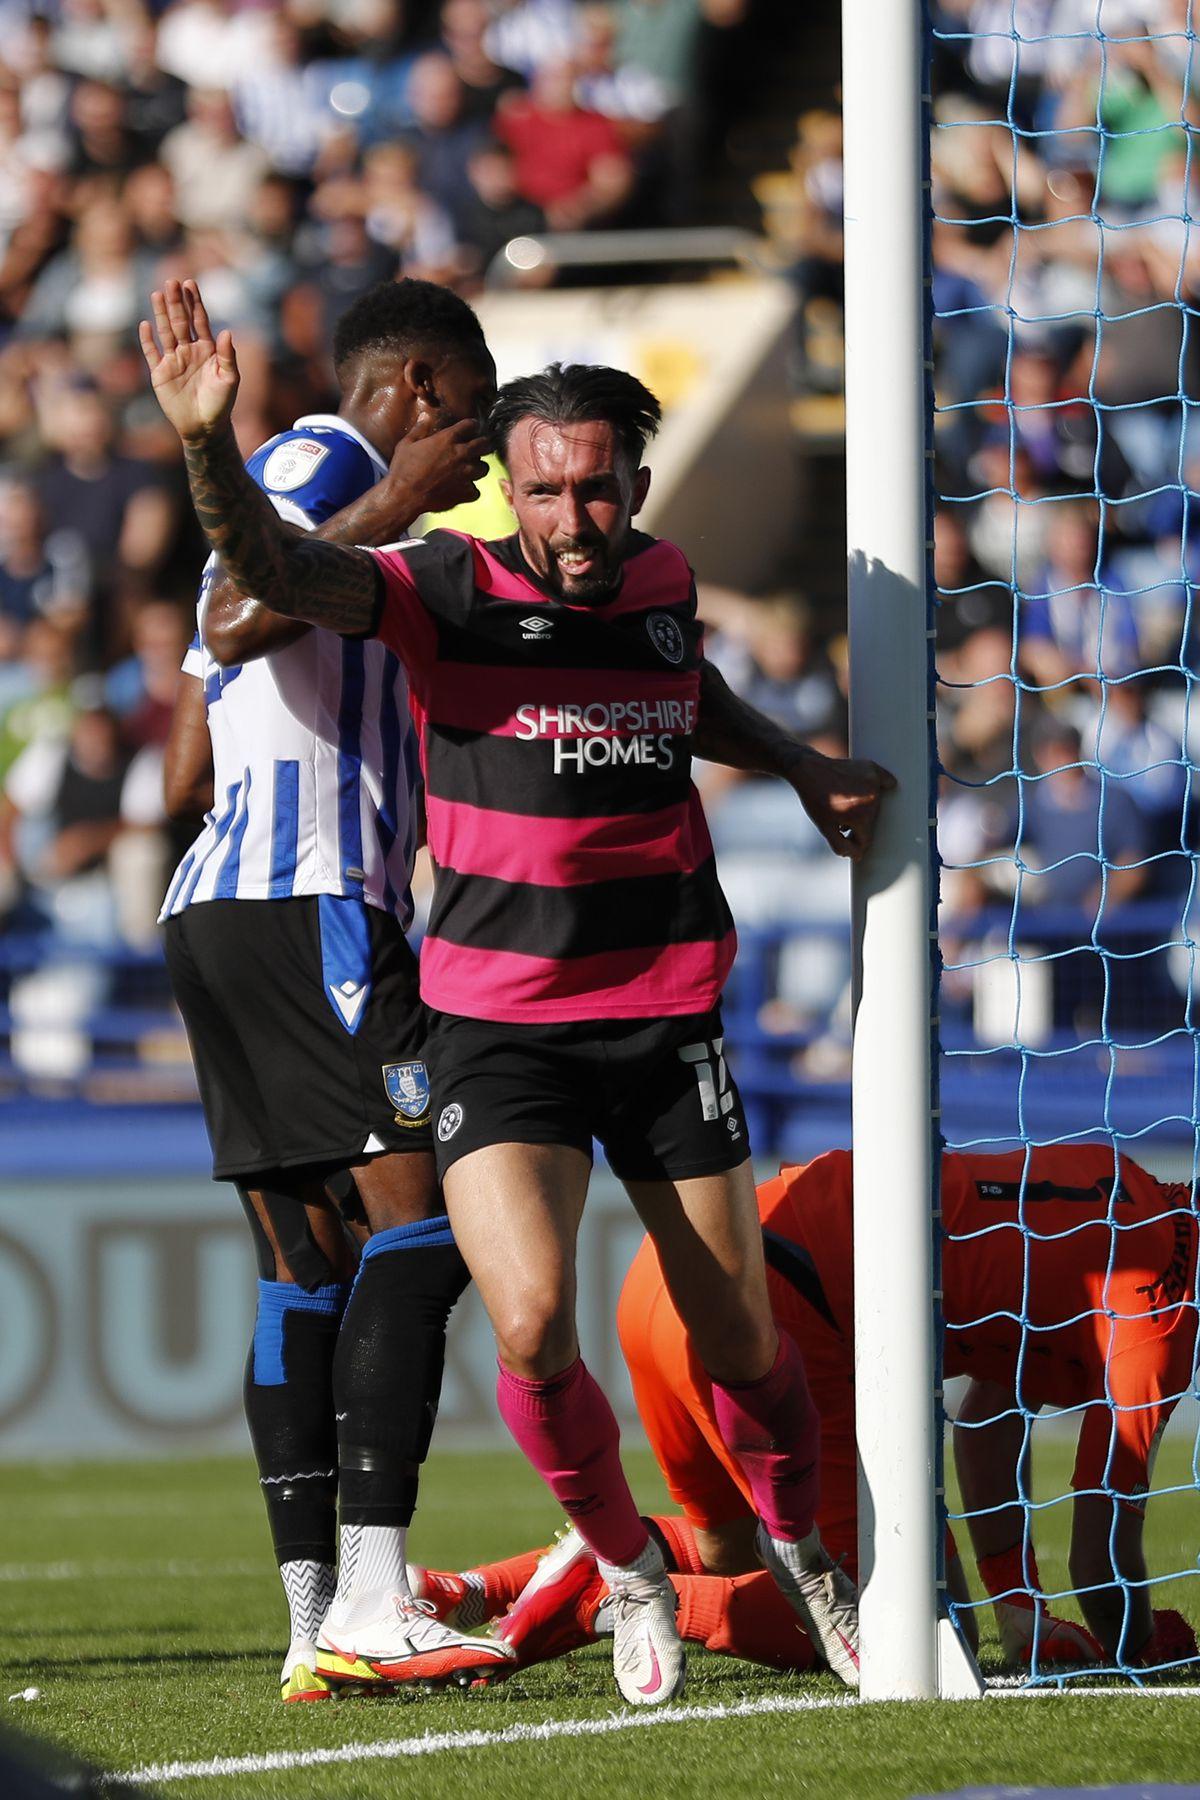 Ryan Bowman of Shrewsbury Town celebrates after scoring a goal to make it 1-1. (AMA)